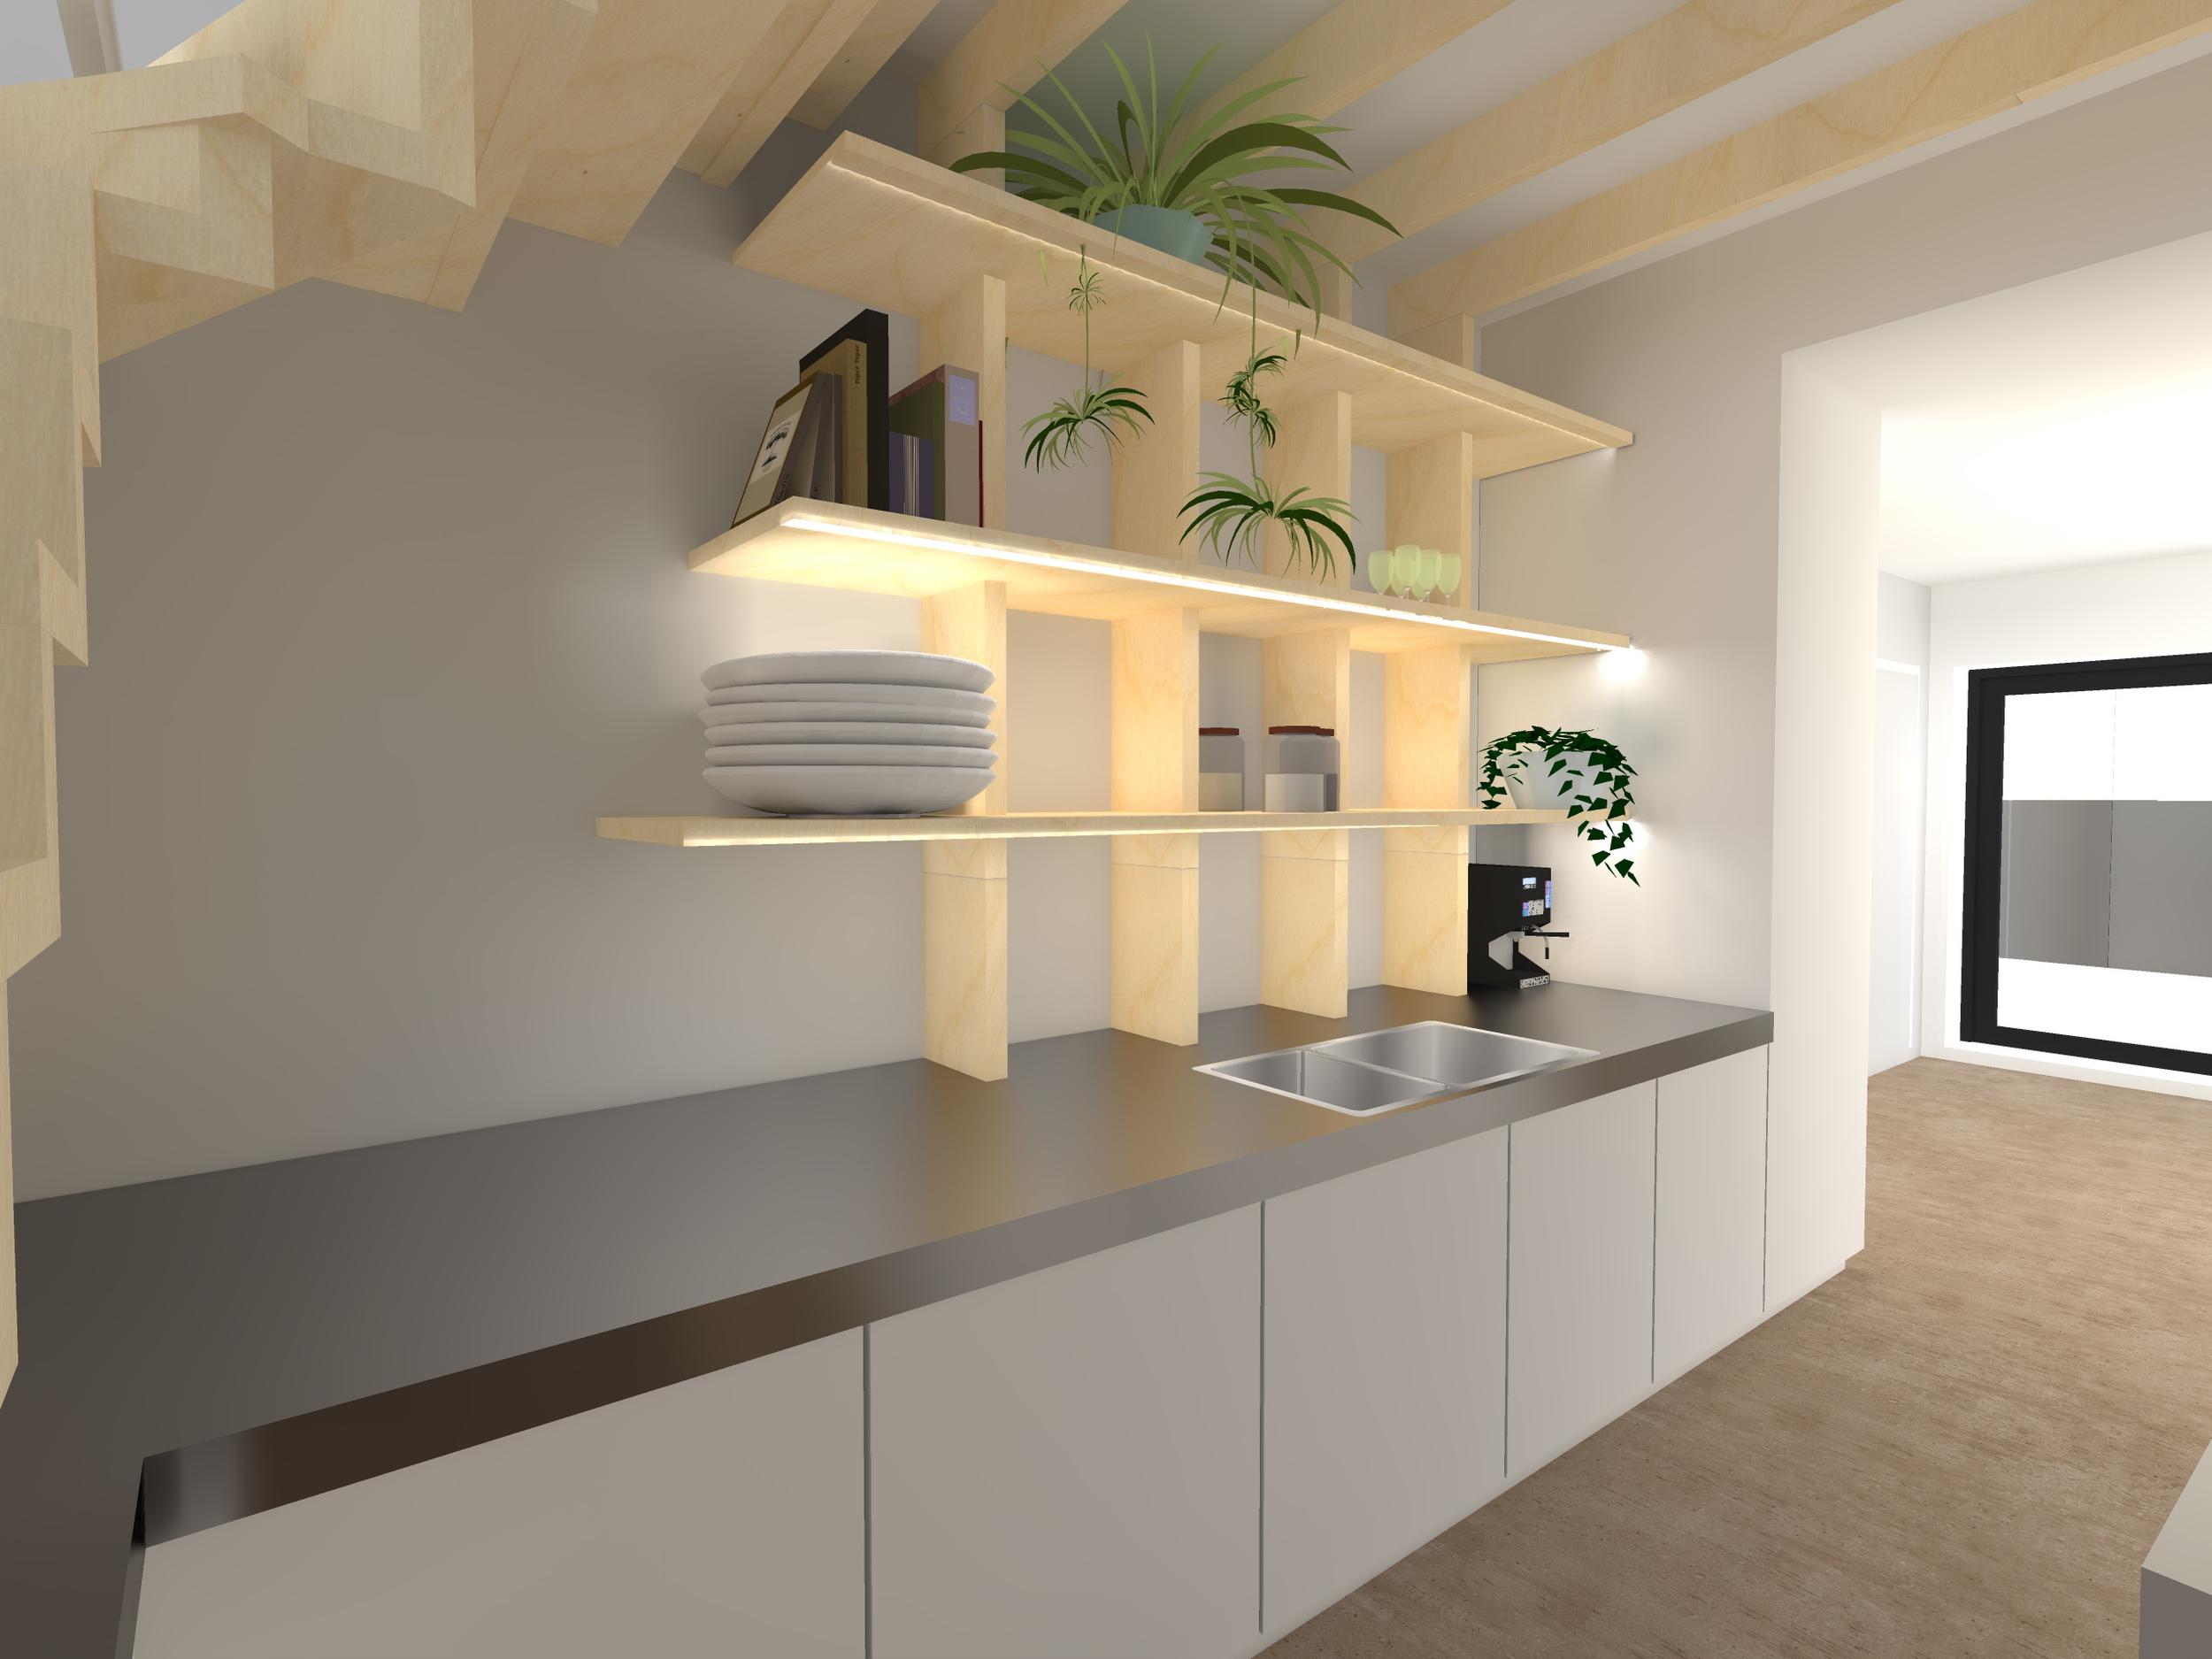 ontwerp keuken 01.jpg